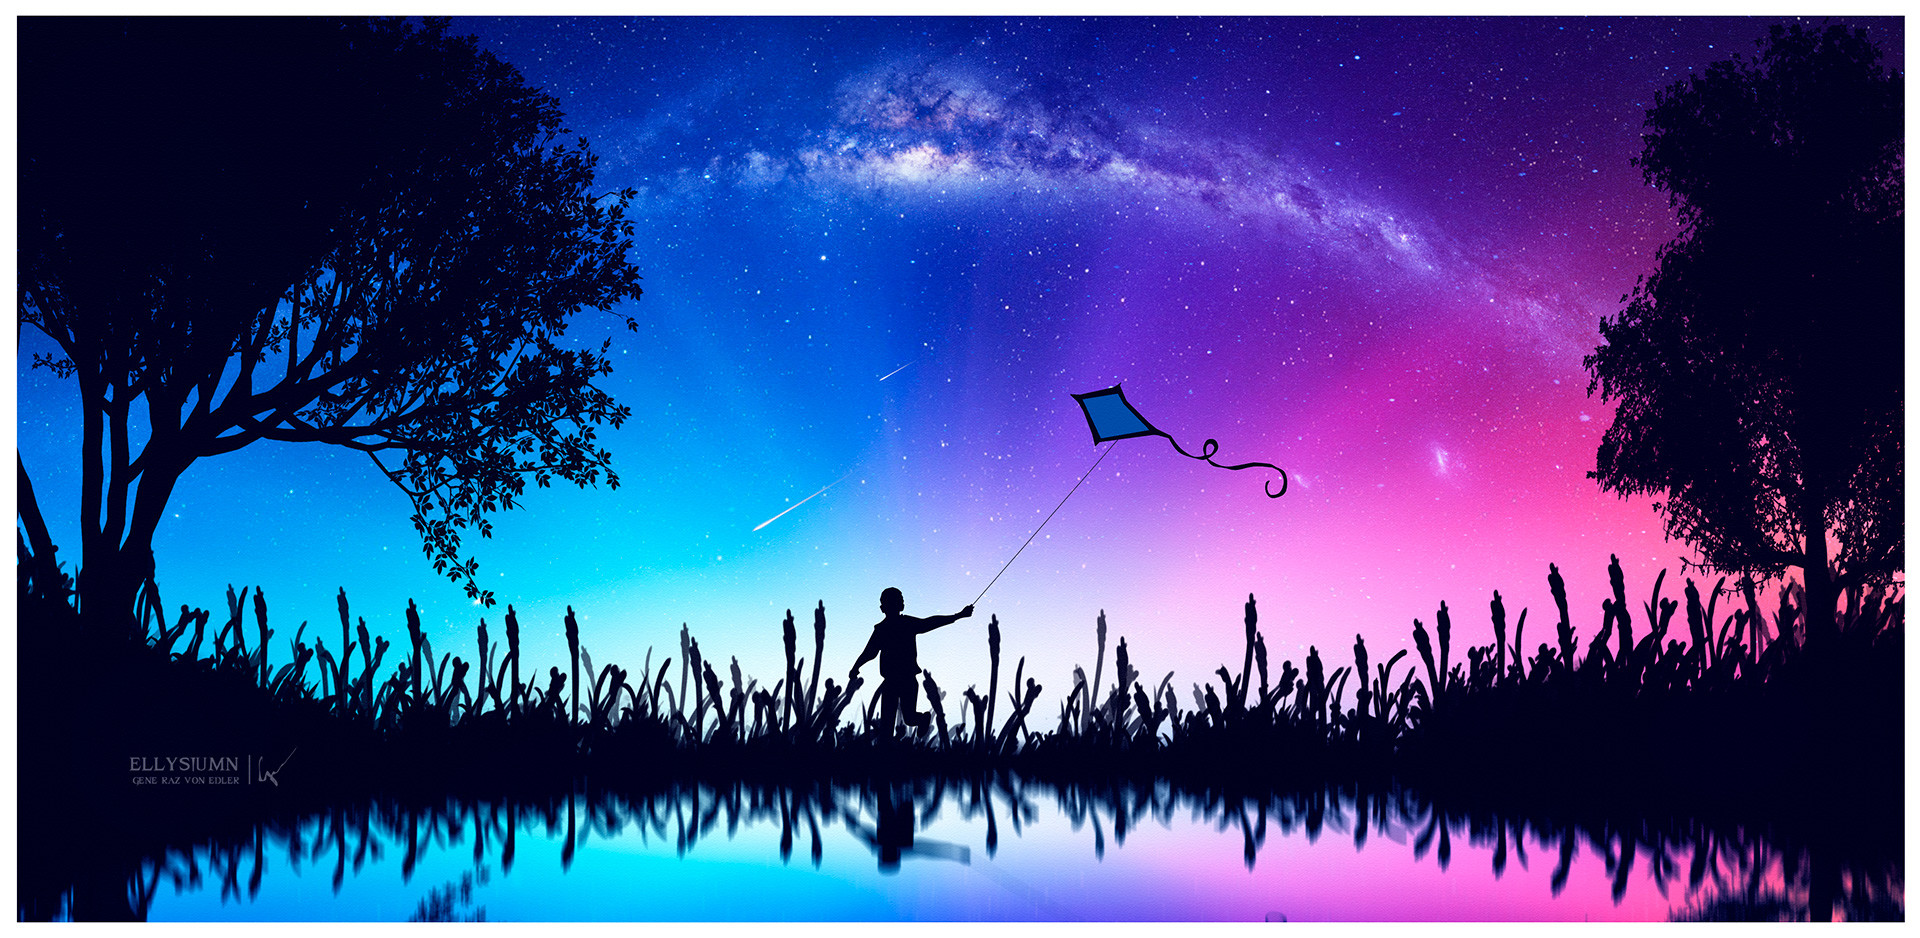 Фото Мальчик с воздушным змеем на фоне розово-голубого неба, by Gene Raz von Edler